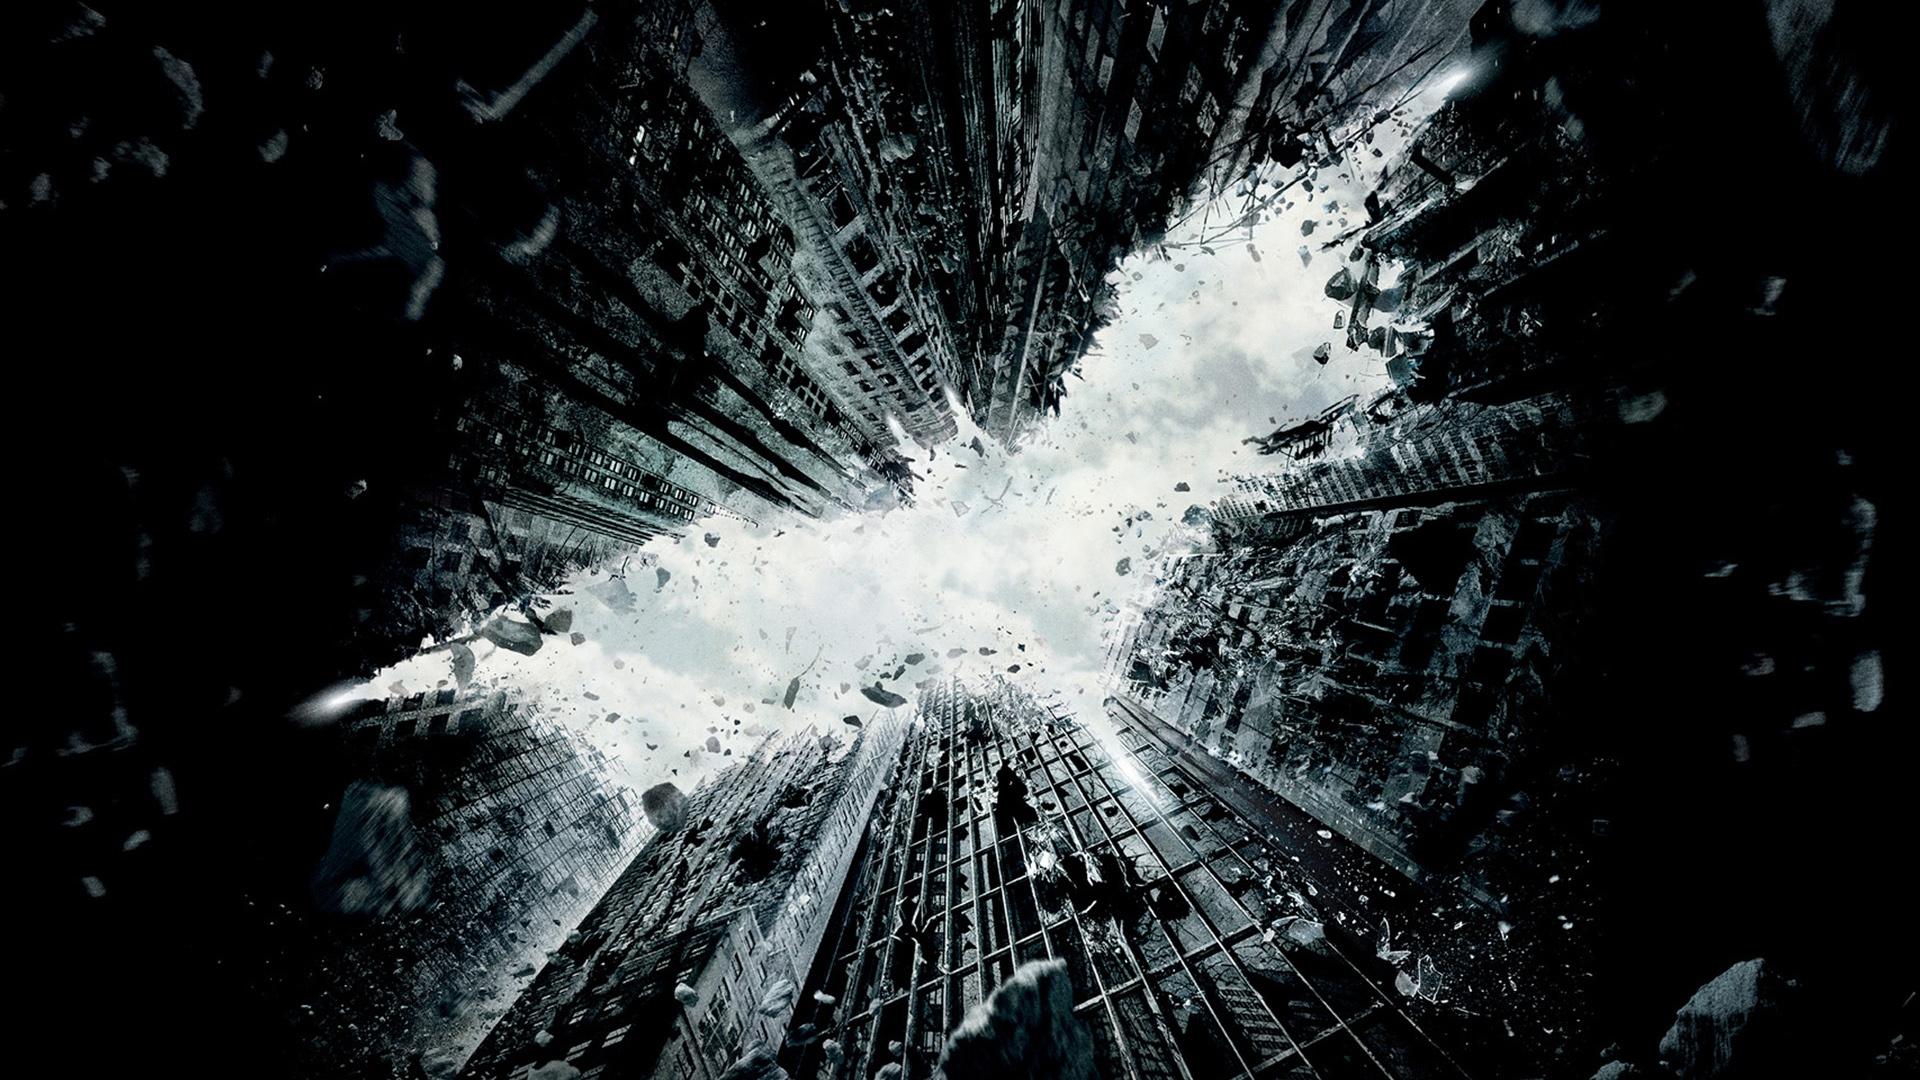 71 The Dark Knight Rises Hd Wallpapers On Wallpapersafari